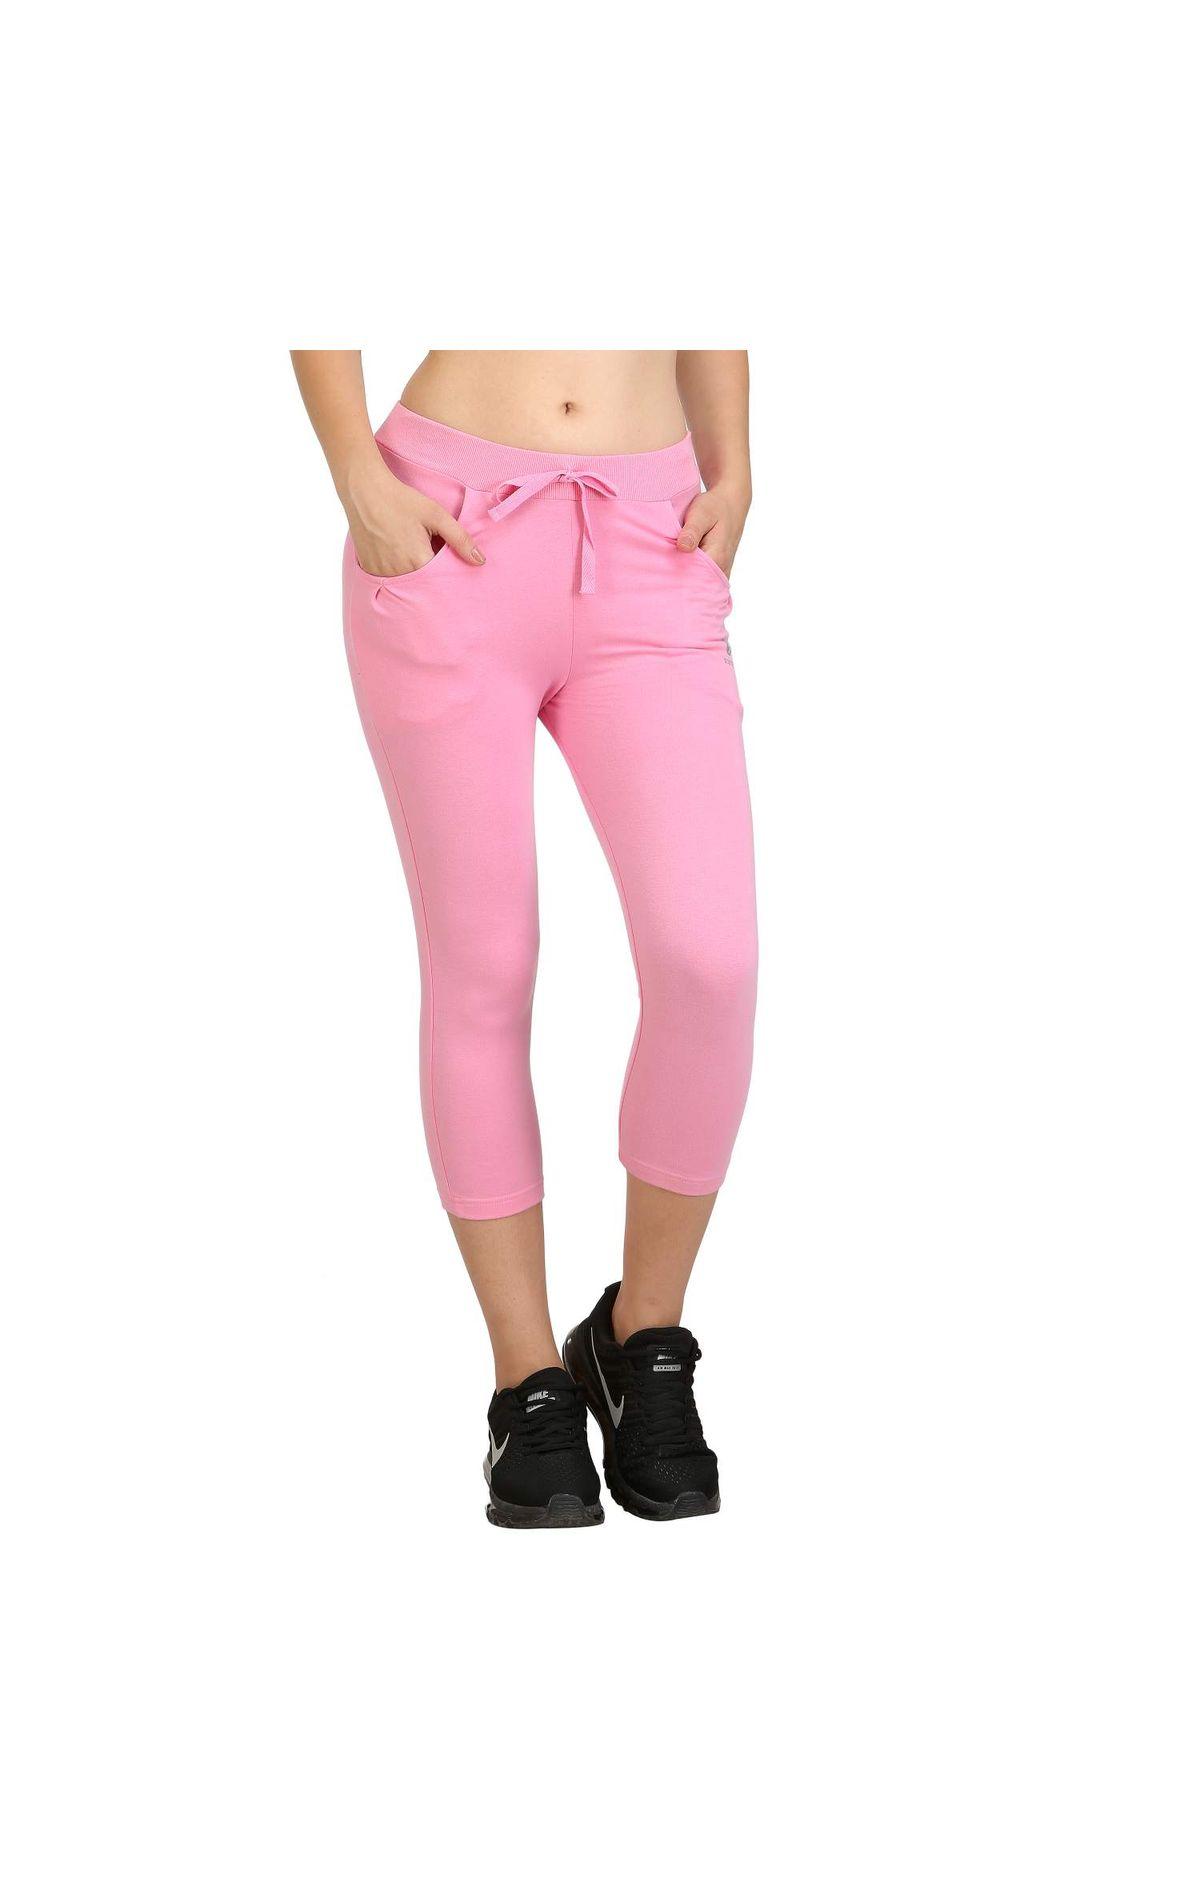 3e844345a715d Bodyactive Women Light Pink Capris-lc1-lpi | Lc1-lpi